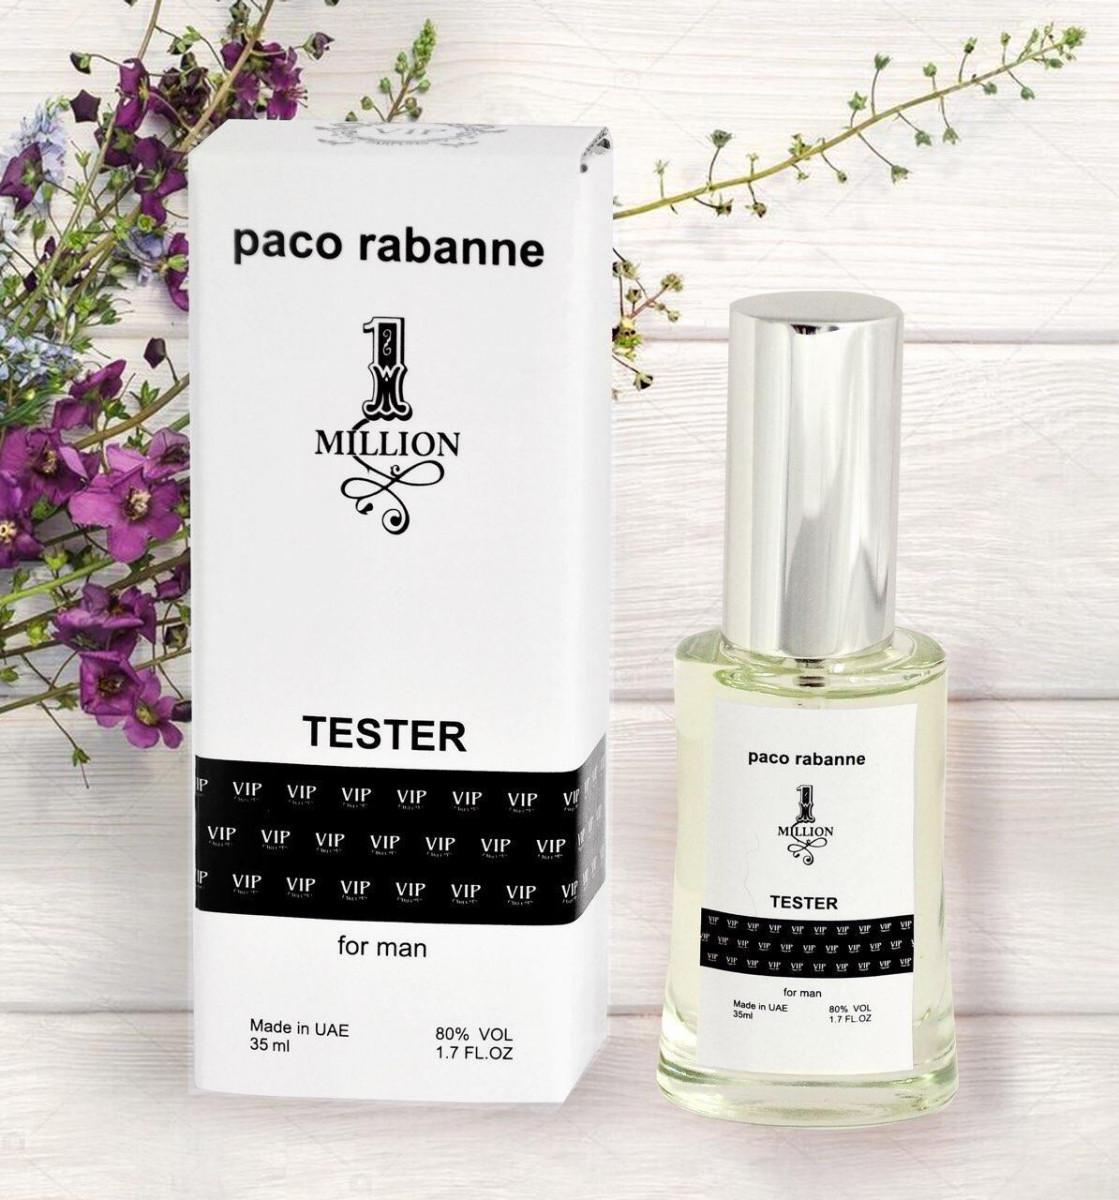 Paco Rabanne 1 Million - Tester 35ml